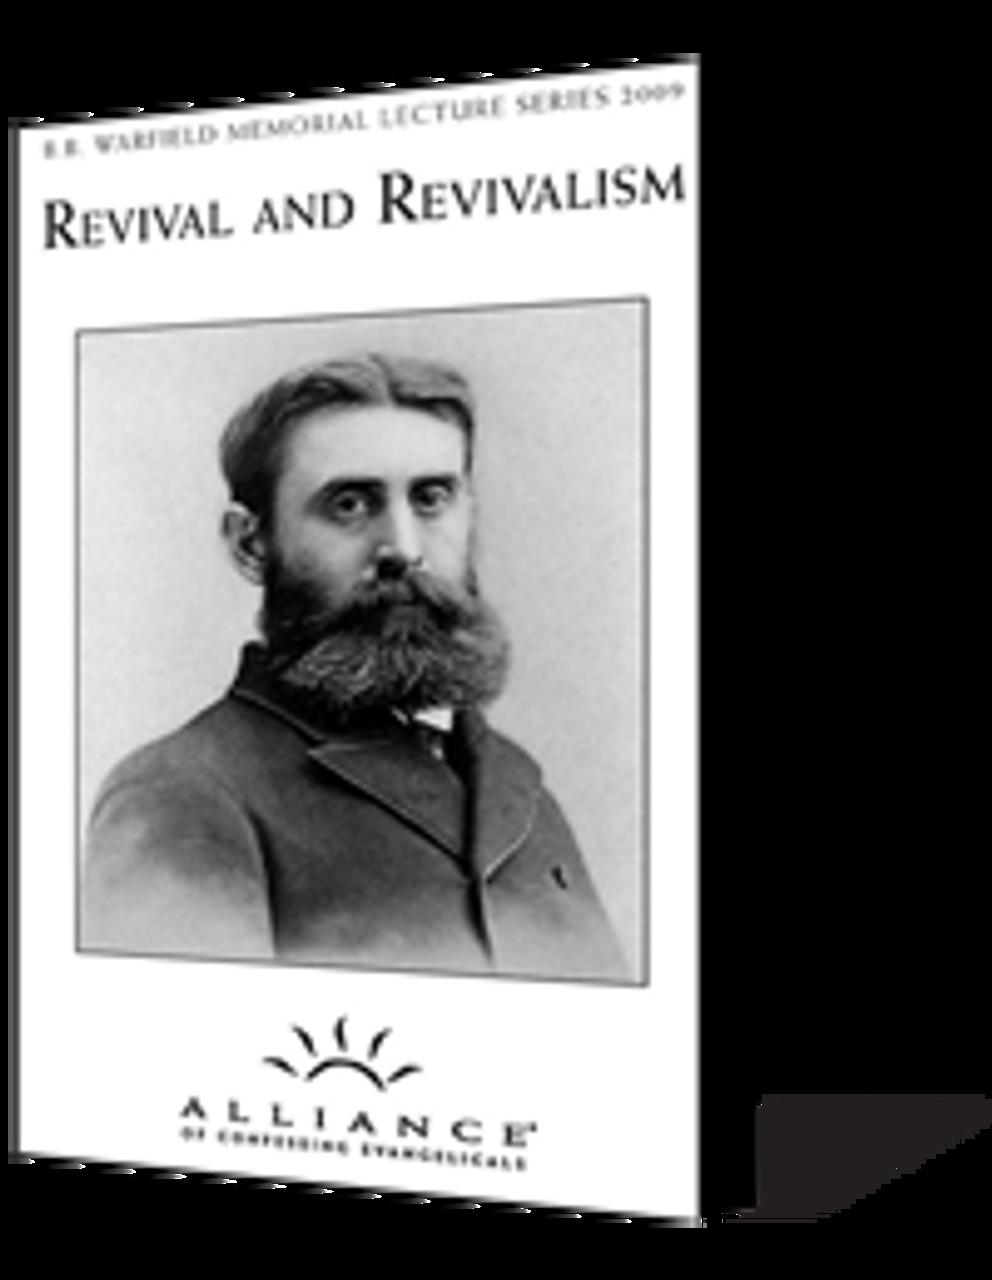 Revival and Revivalism (mp3 Download Set)